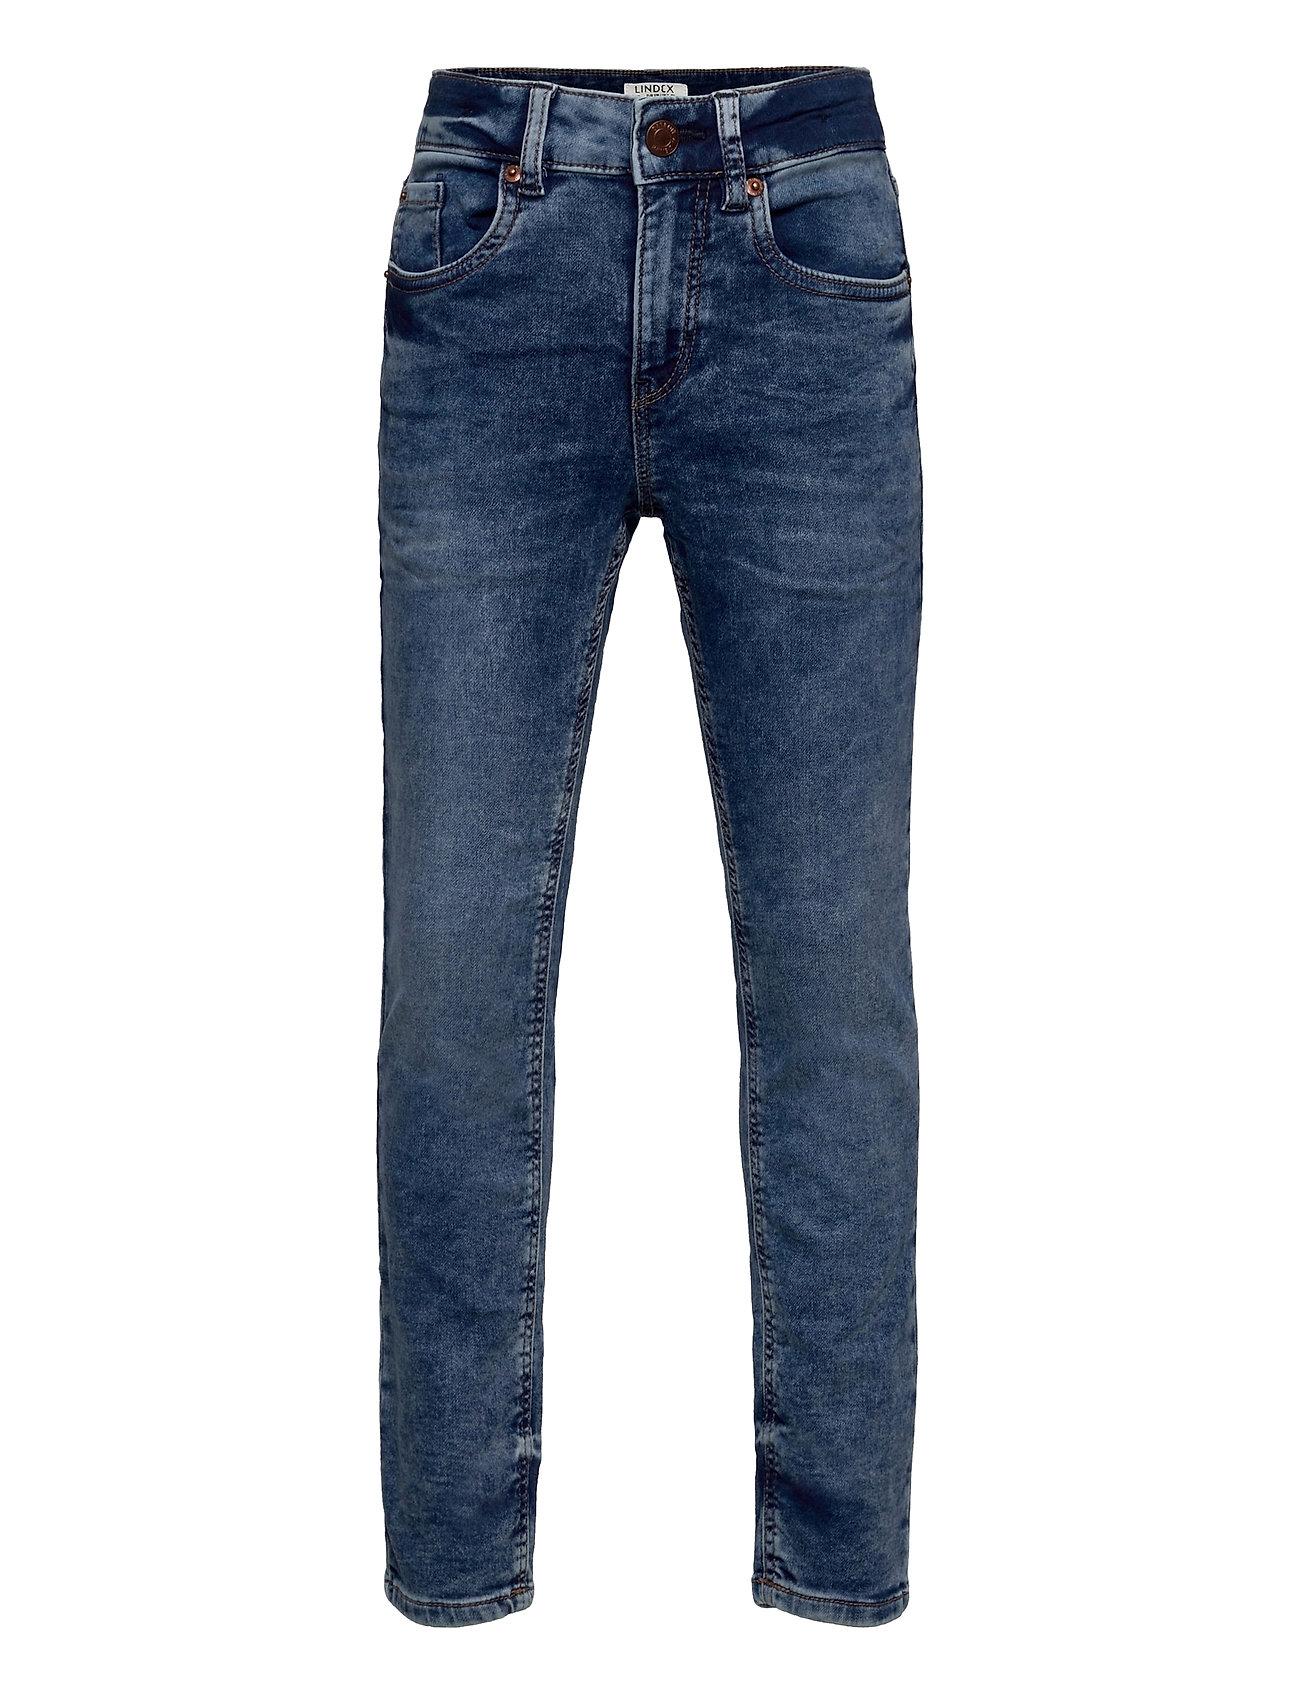 Trousers Denim Jersey Sture Re Jeans Blå Lindex